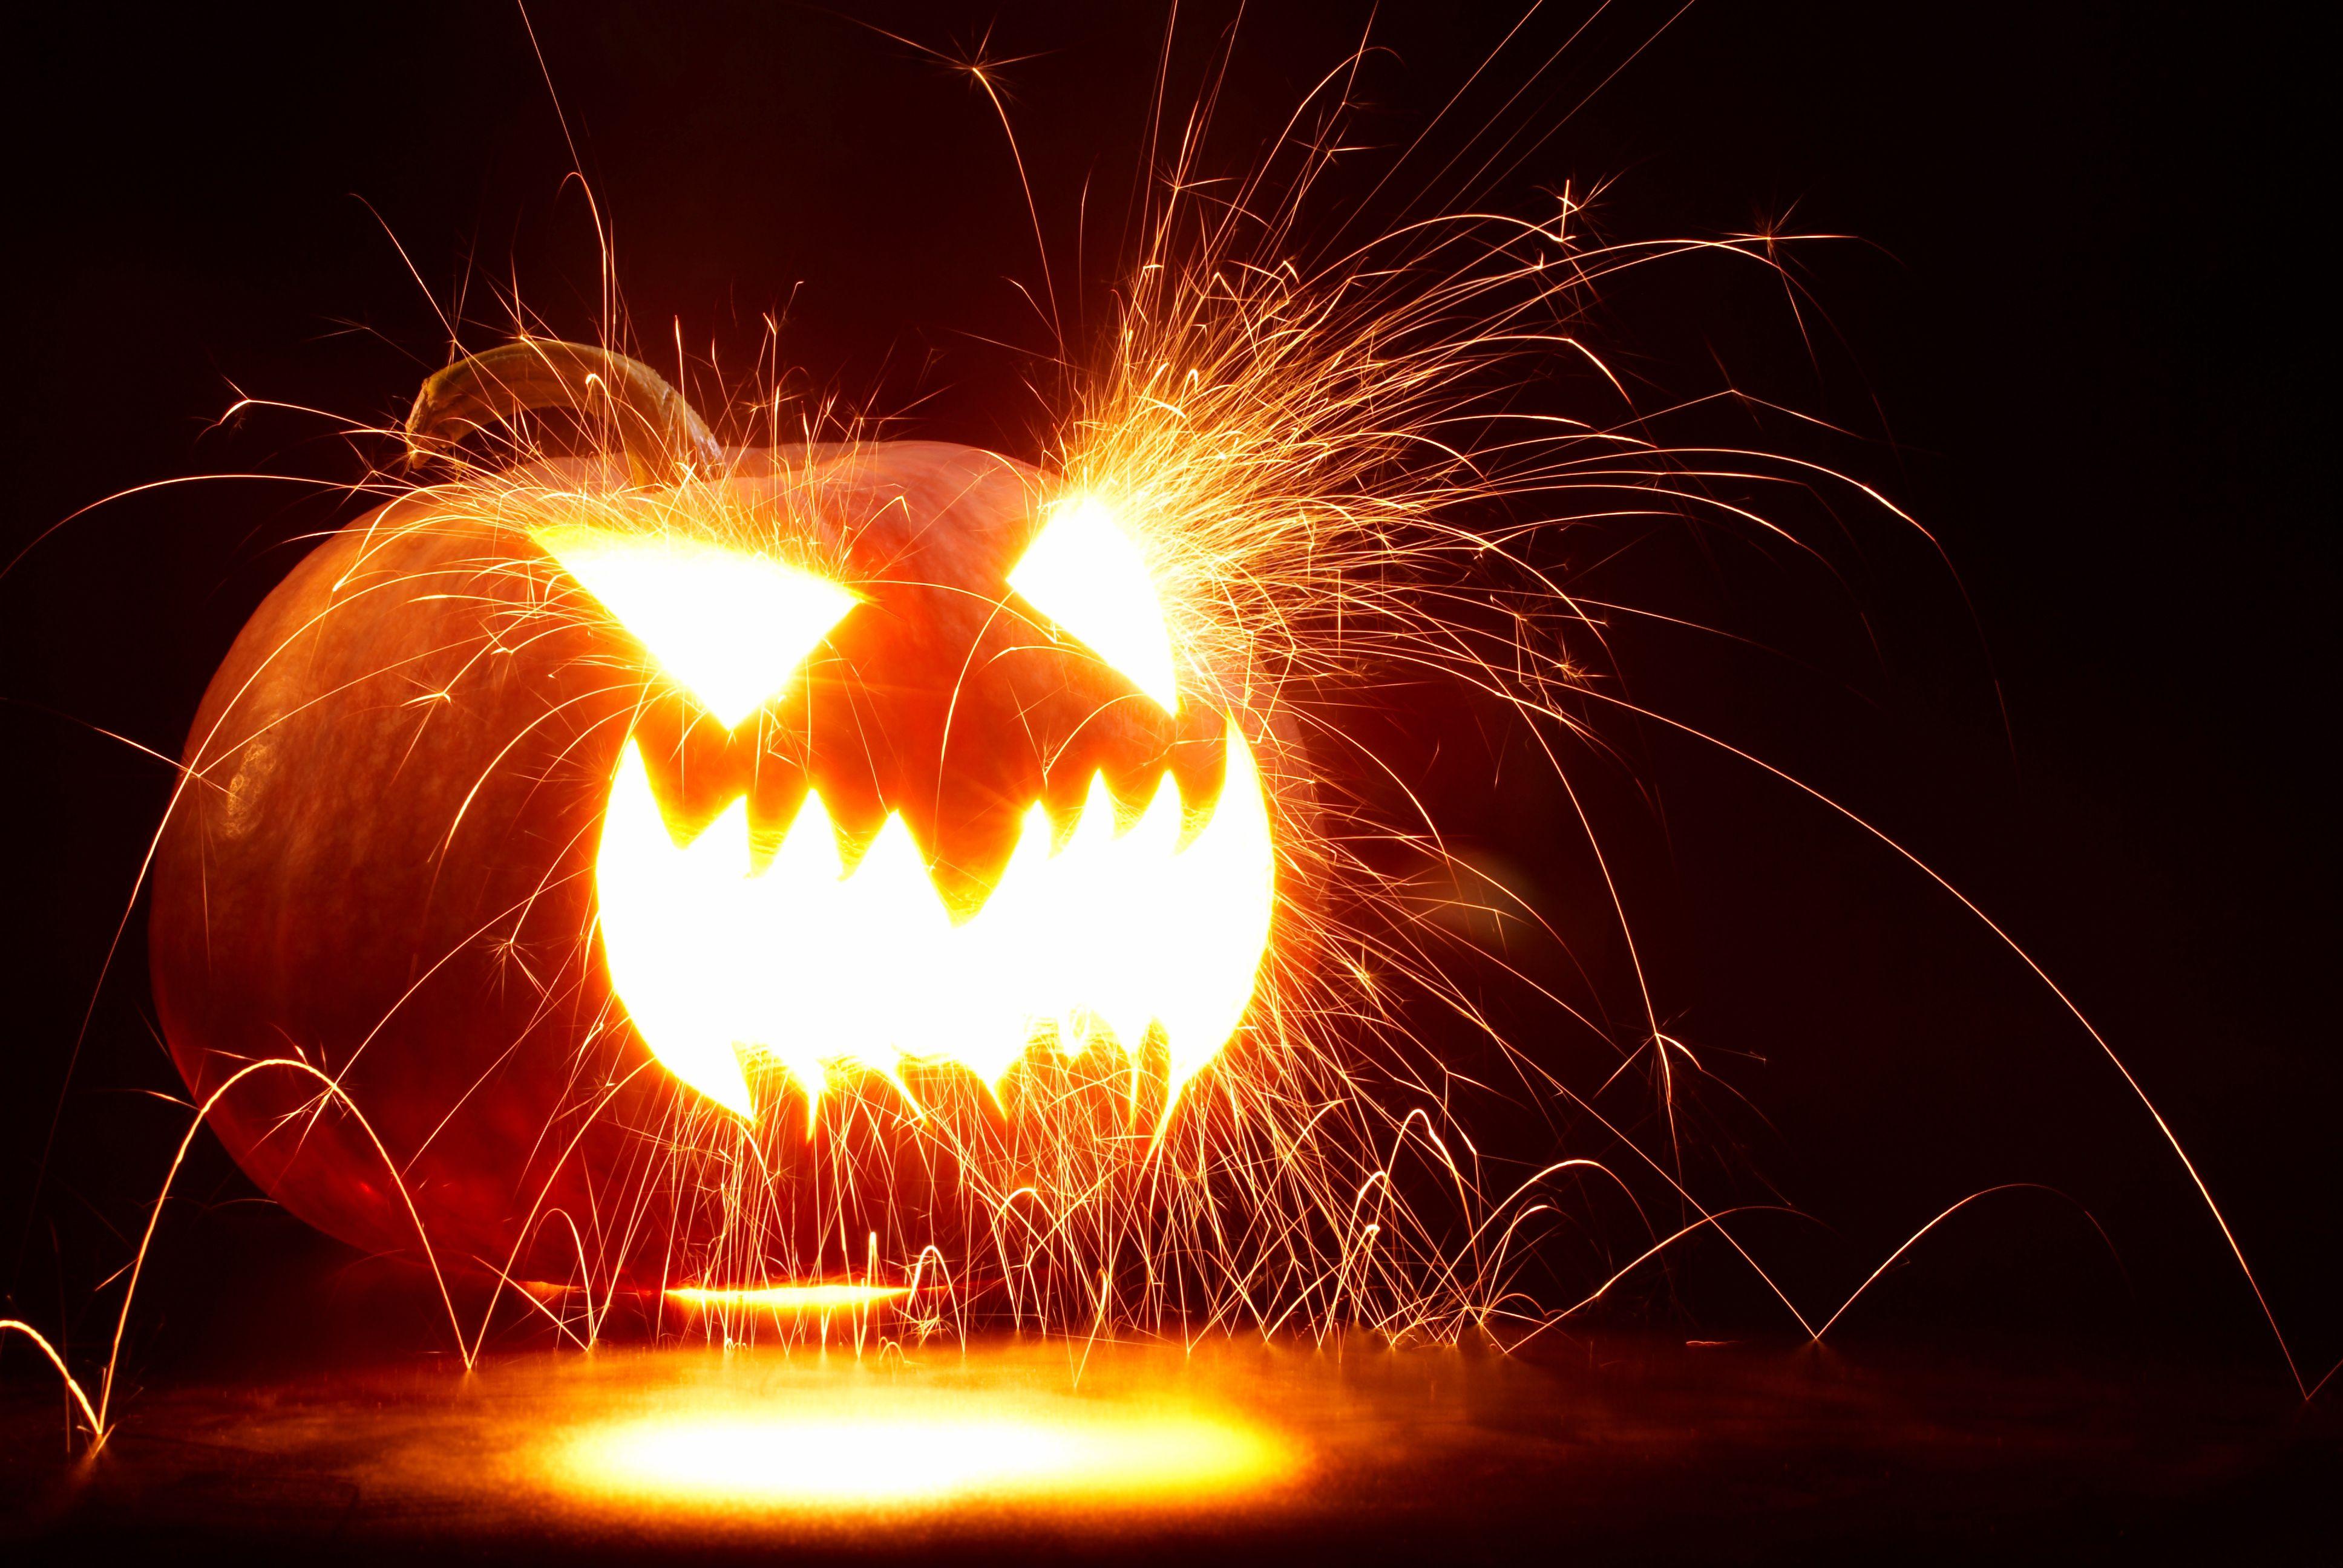 Self Carving Exploding Pumpkin Jack o Lantern